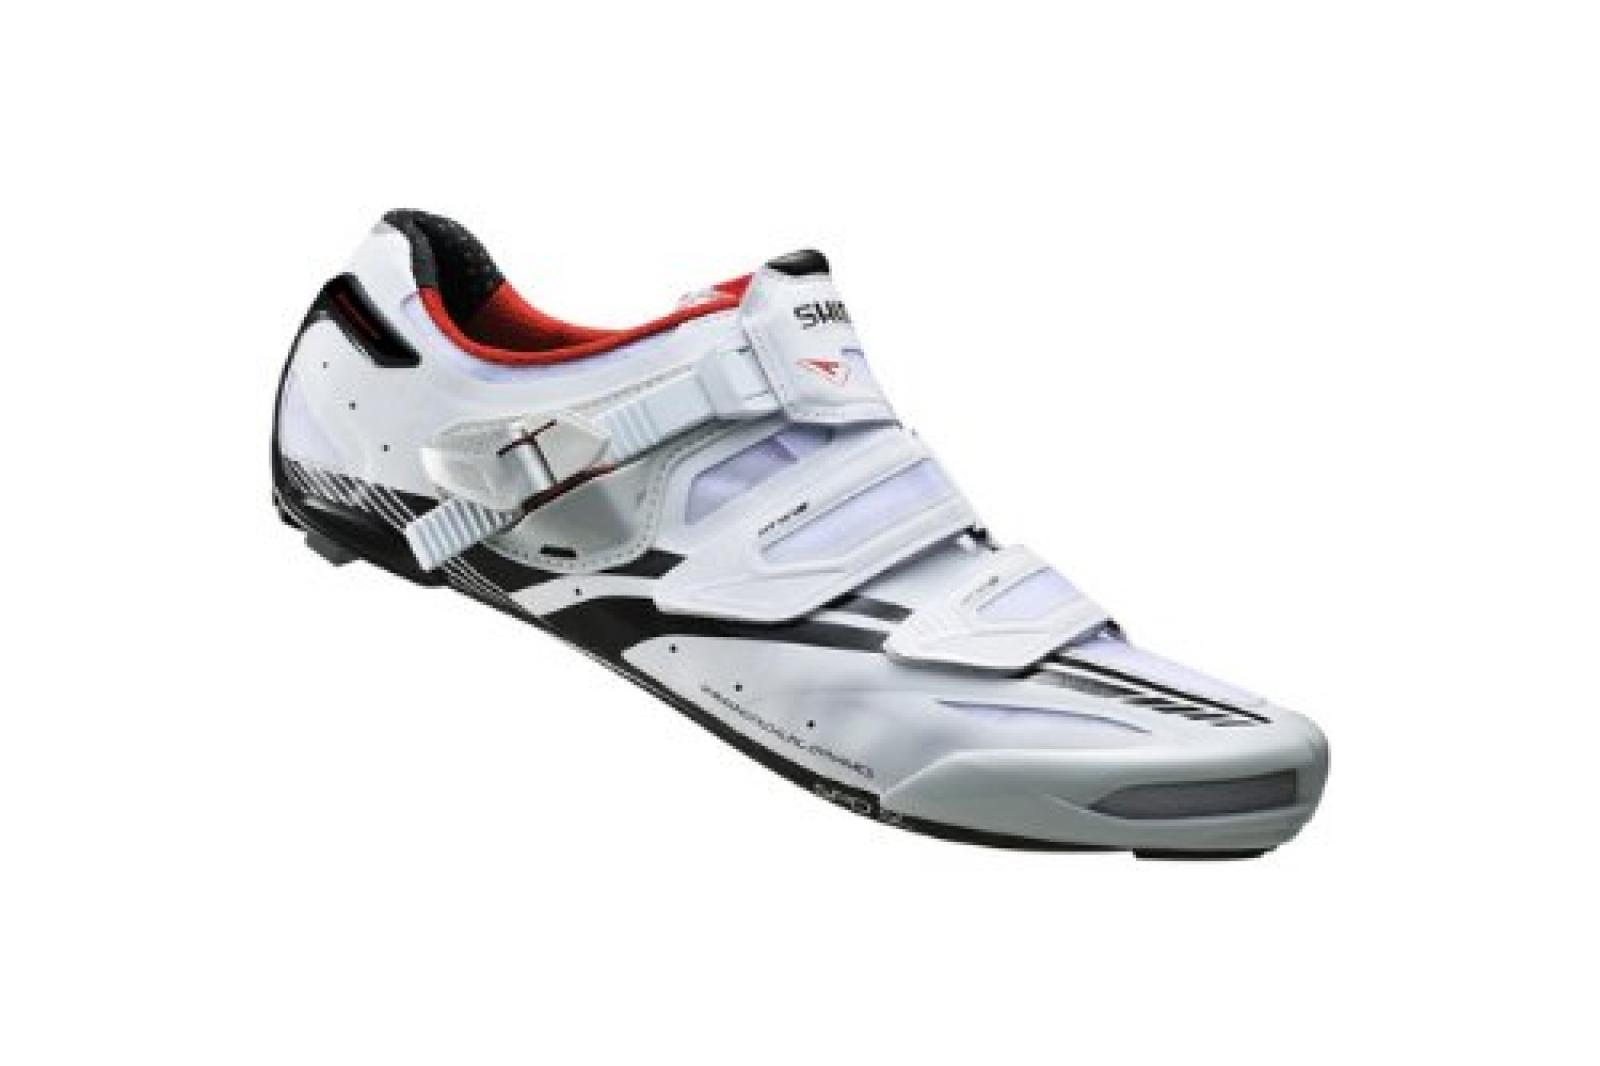 Shimano SH-R320W Schuhe men white 2014